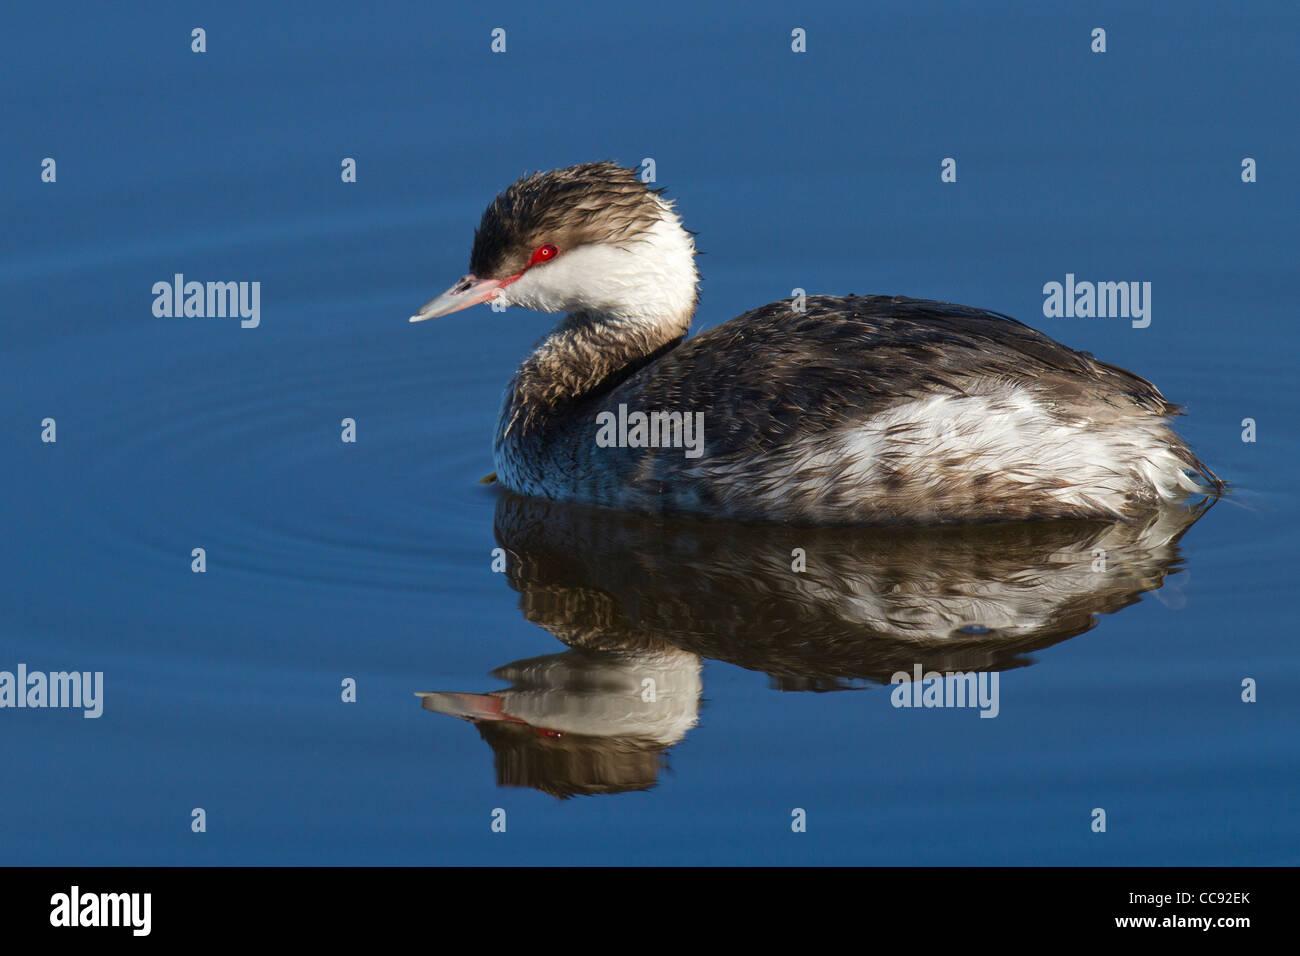 winter plumaged Horned Grebe (Podiceps auritus) - Stock Image